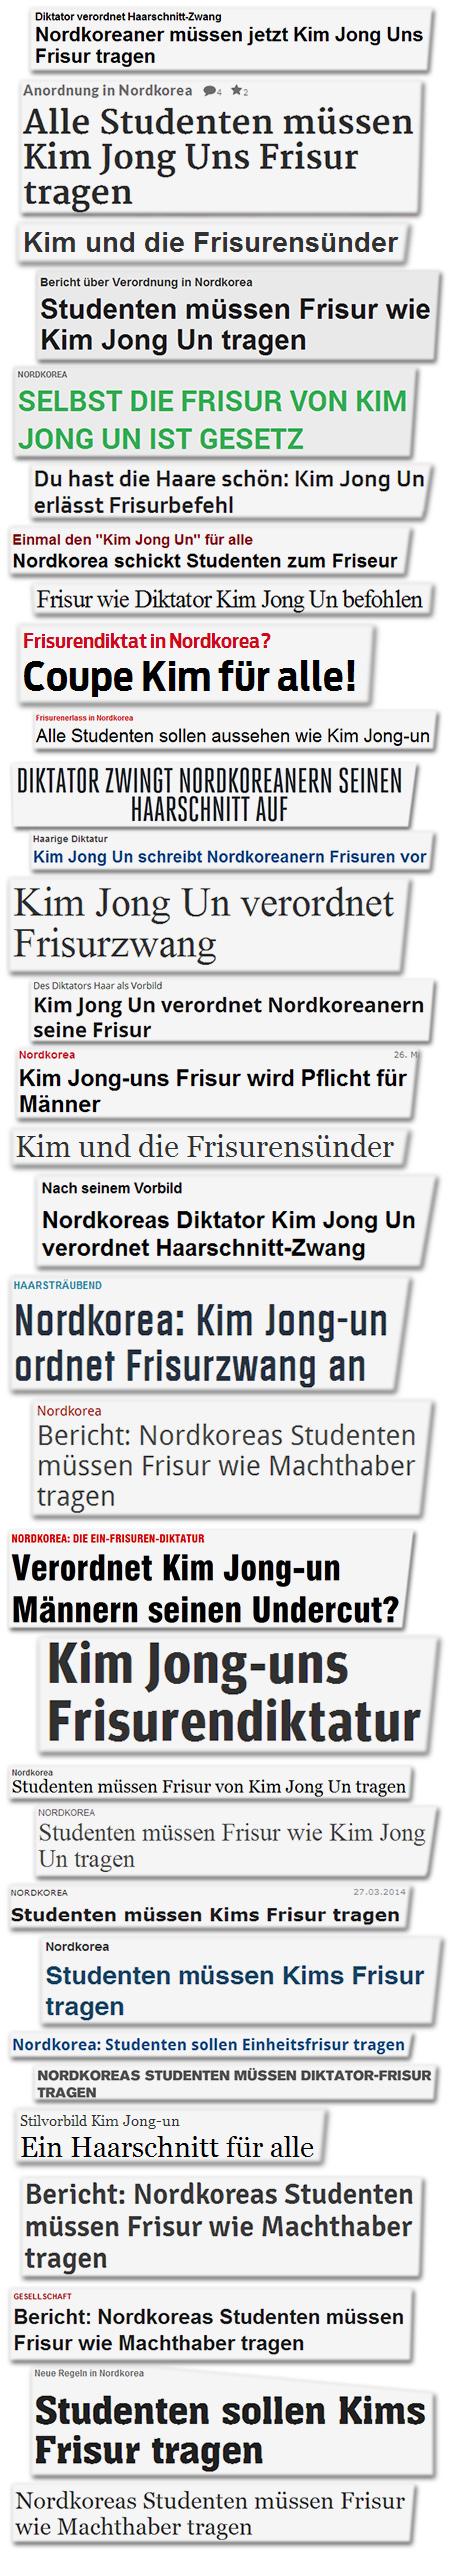 Screenshots: diverse